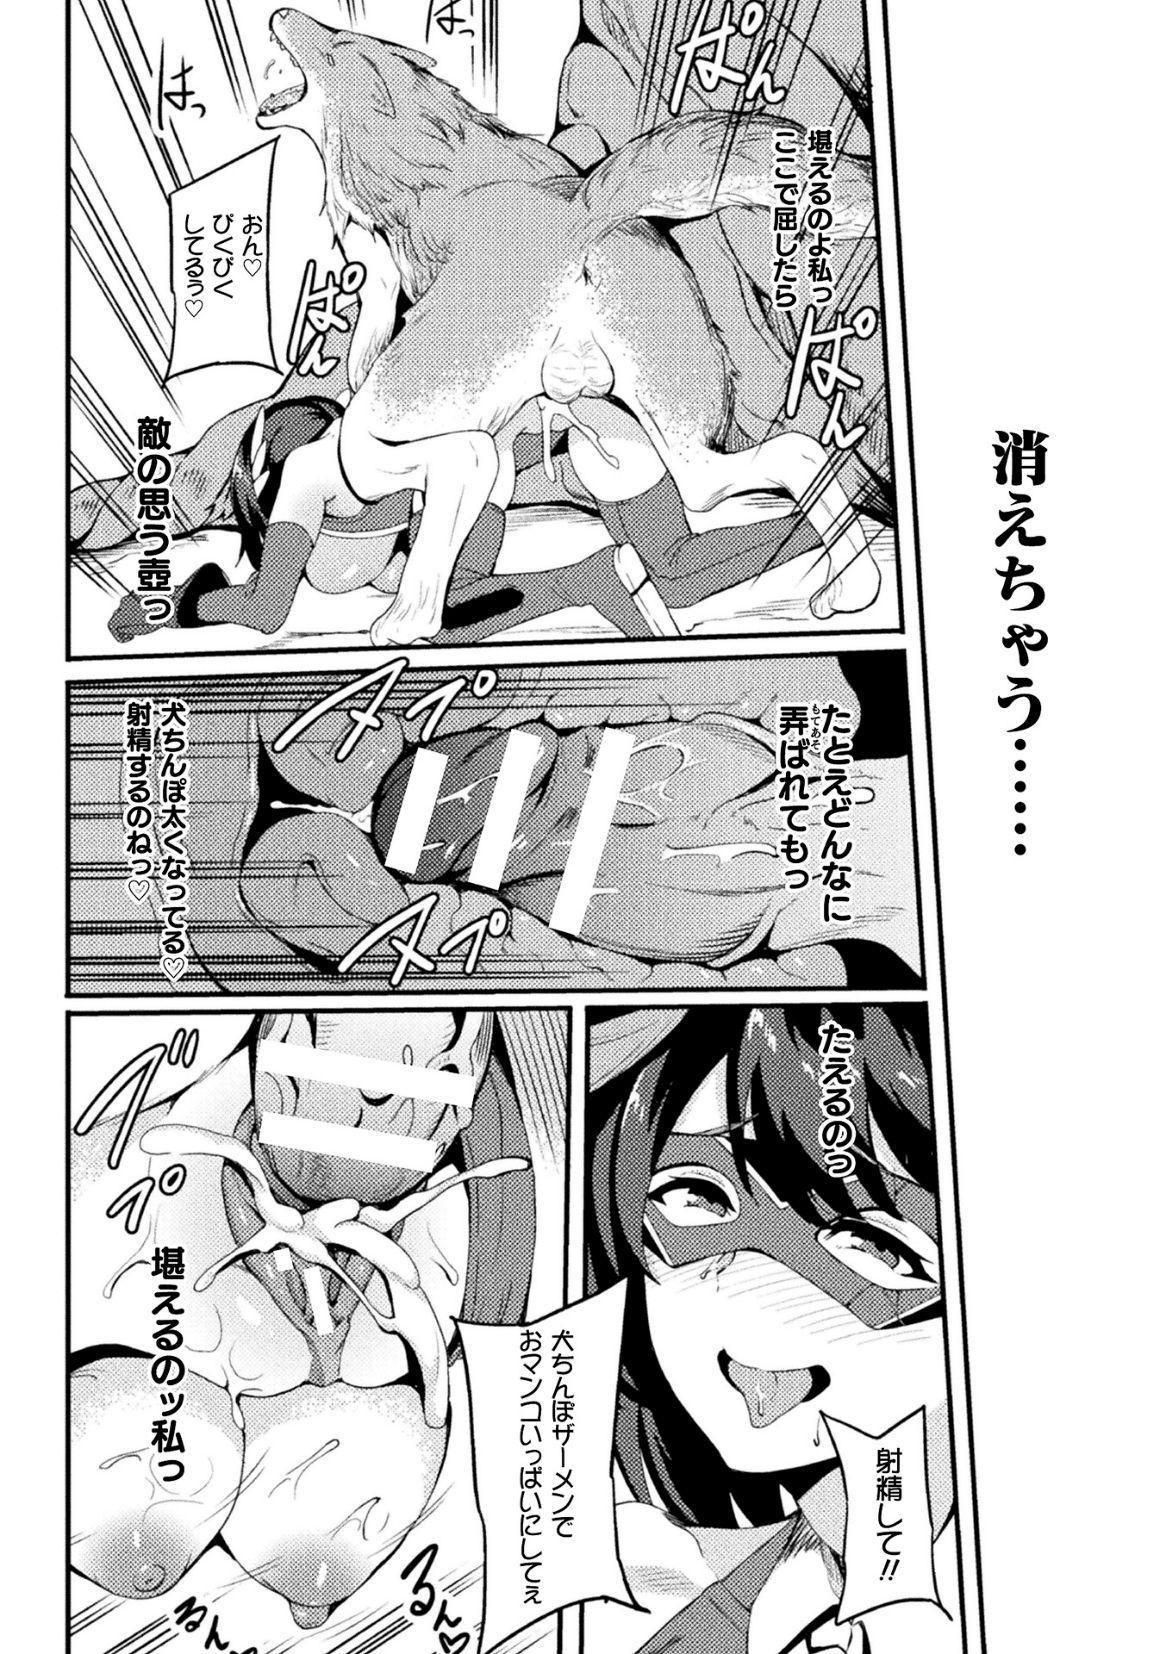 [Rinsun] Power Girl ~JK Super Heroine no Saiin Darakuki~ Ch. 2 15